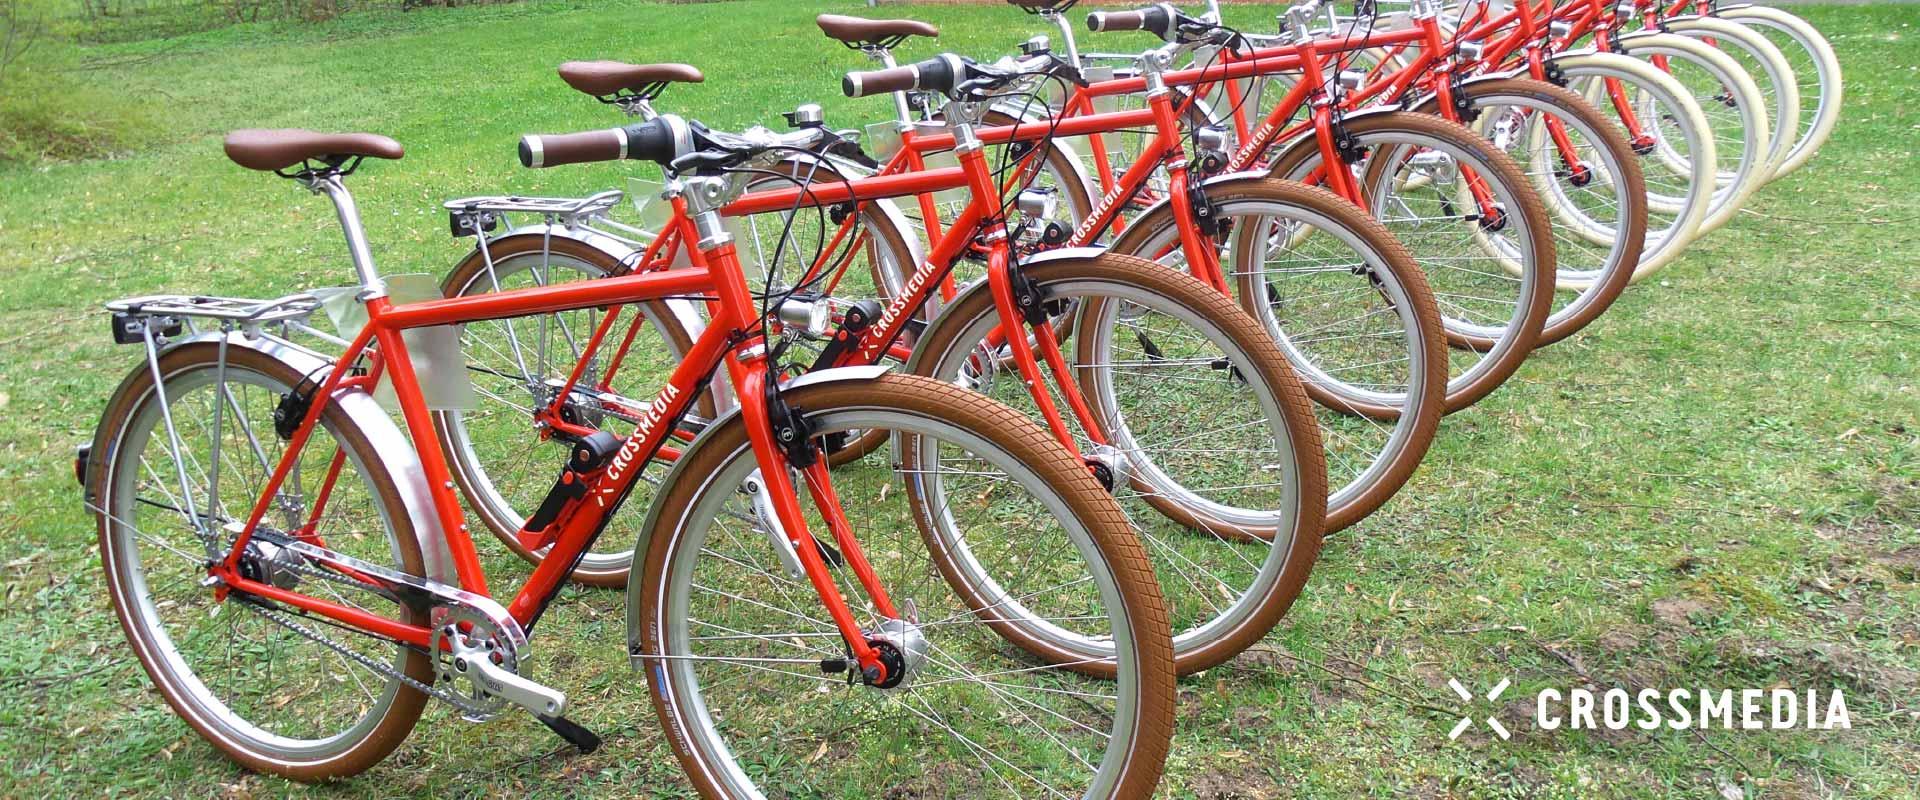 Leih-Fahrrad Crossmedia